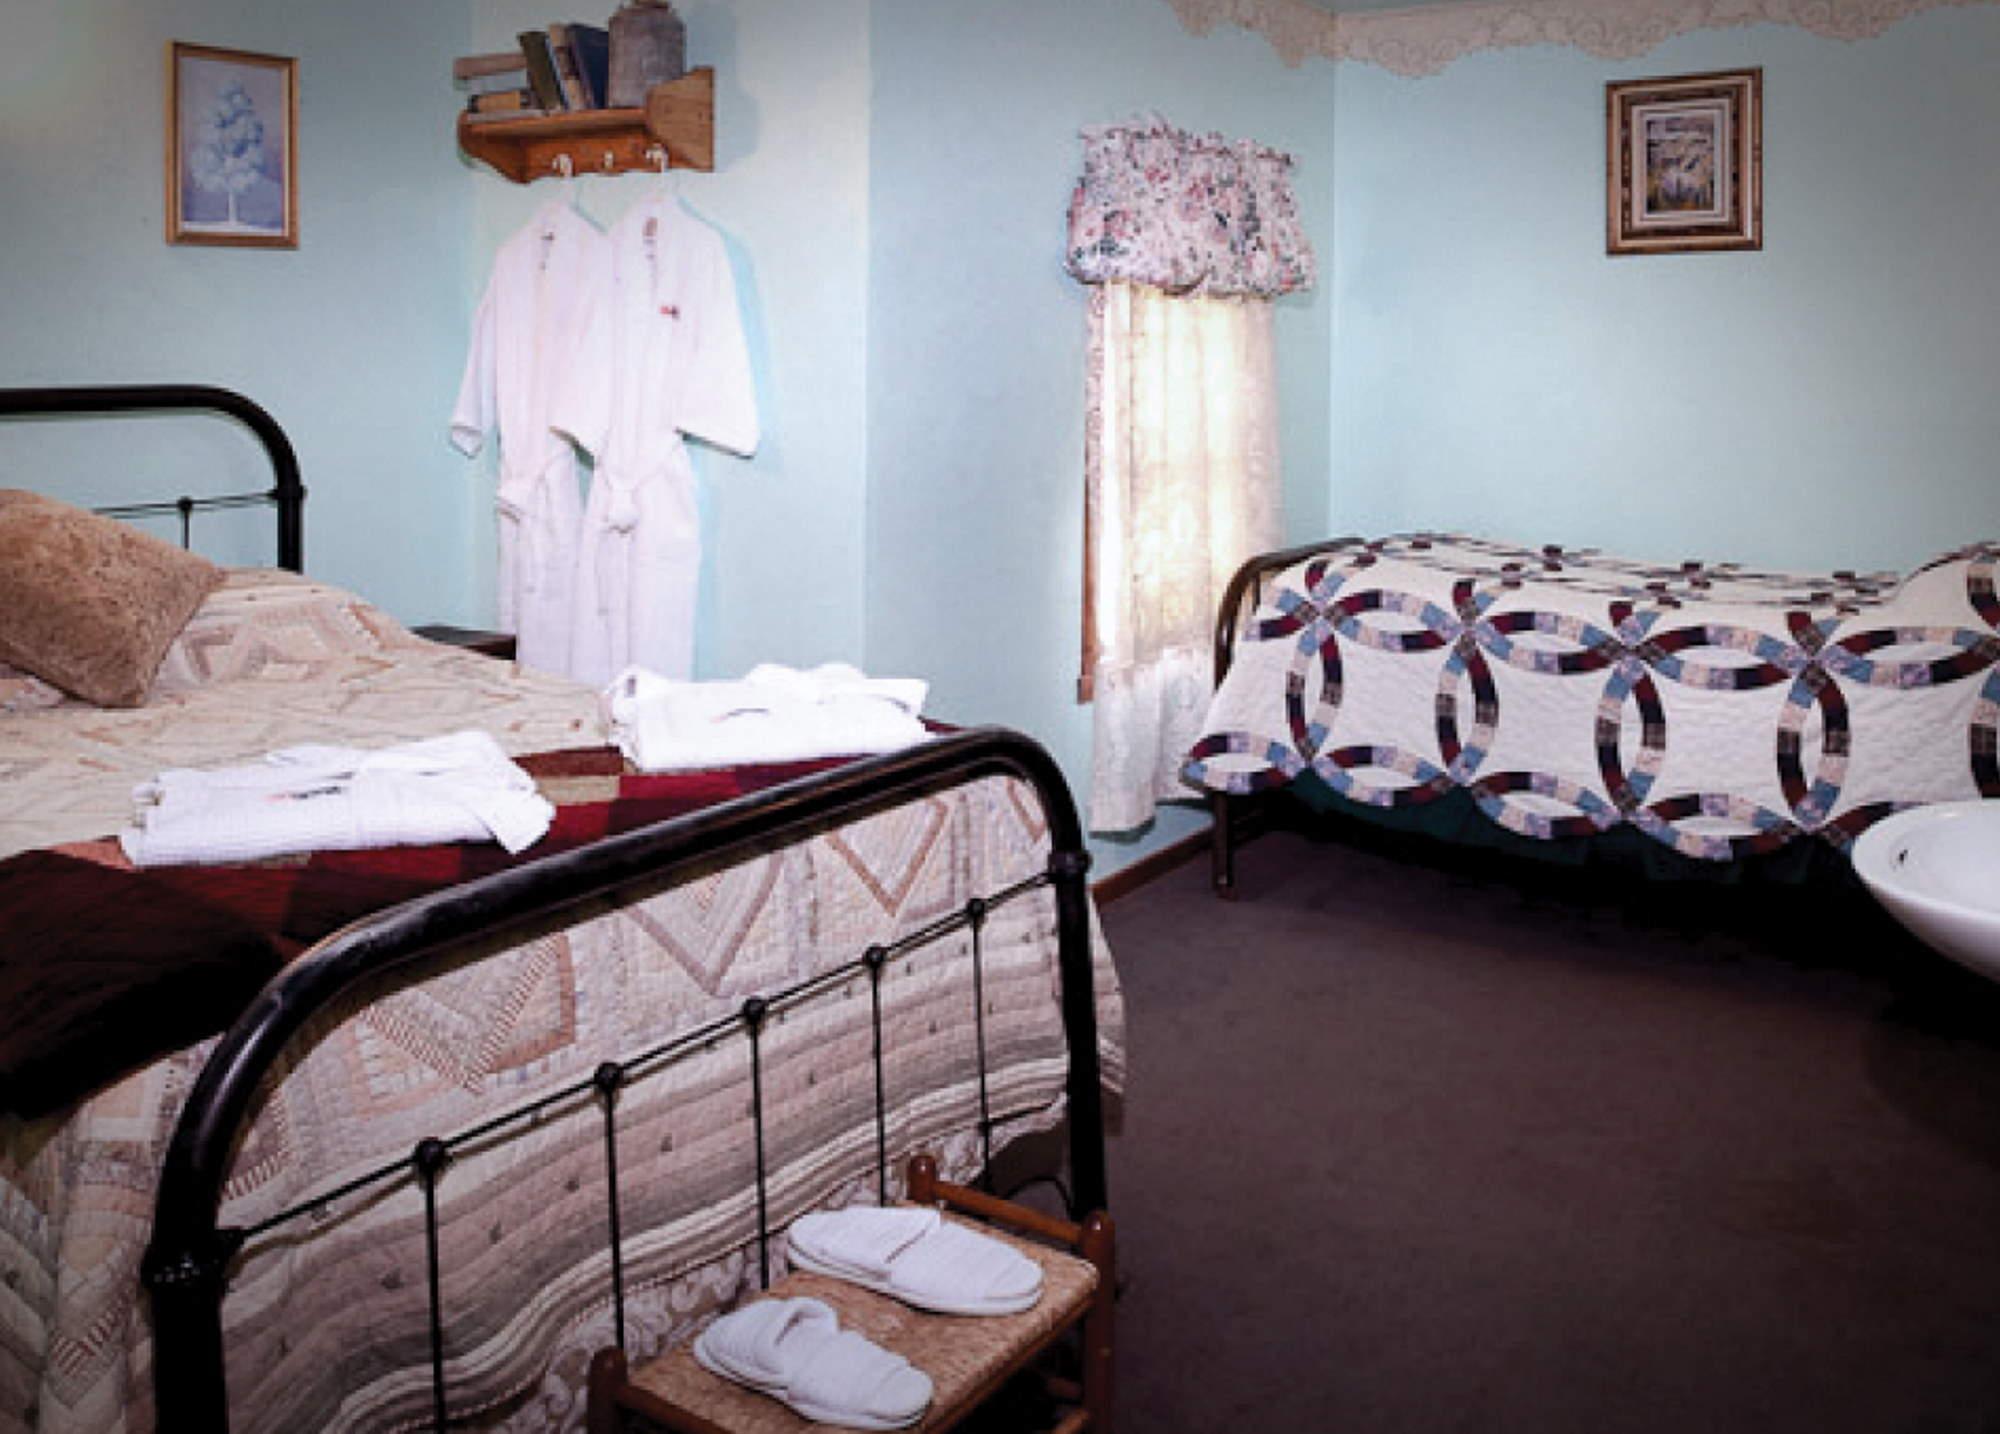 Interior of Ma Johnson's Hotel room